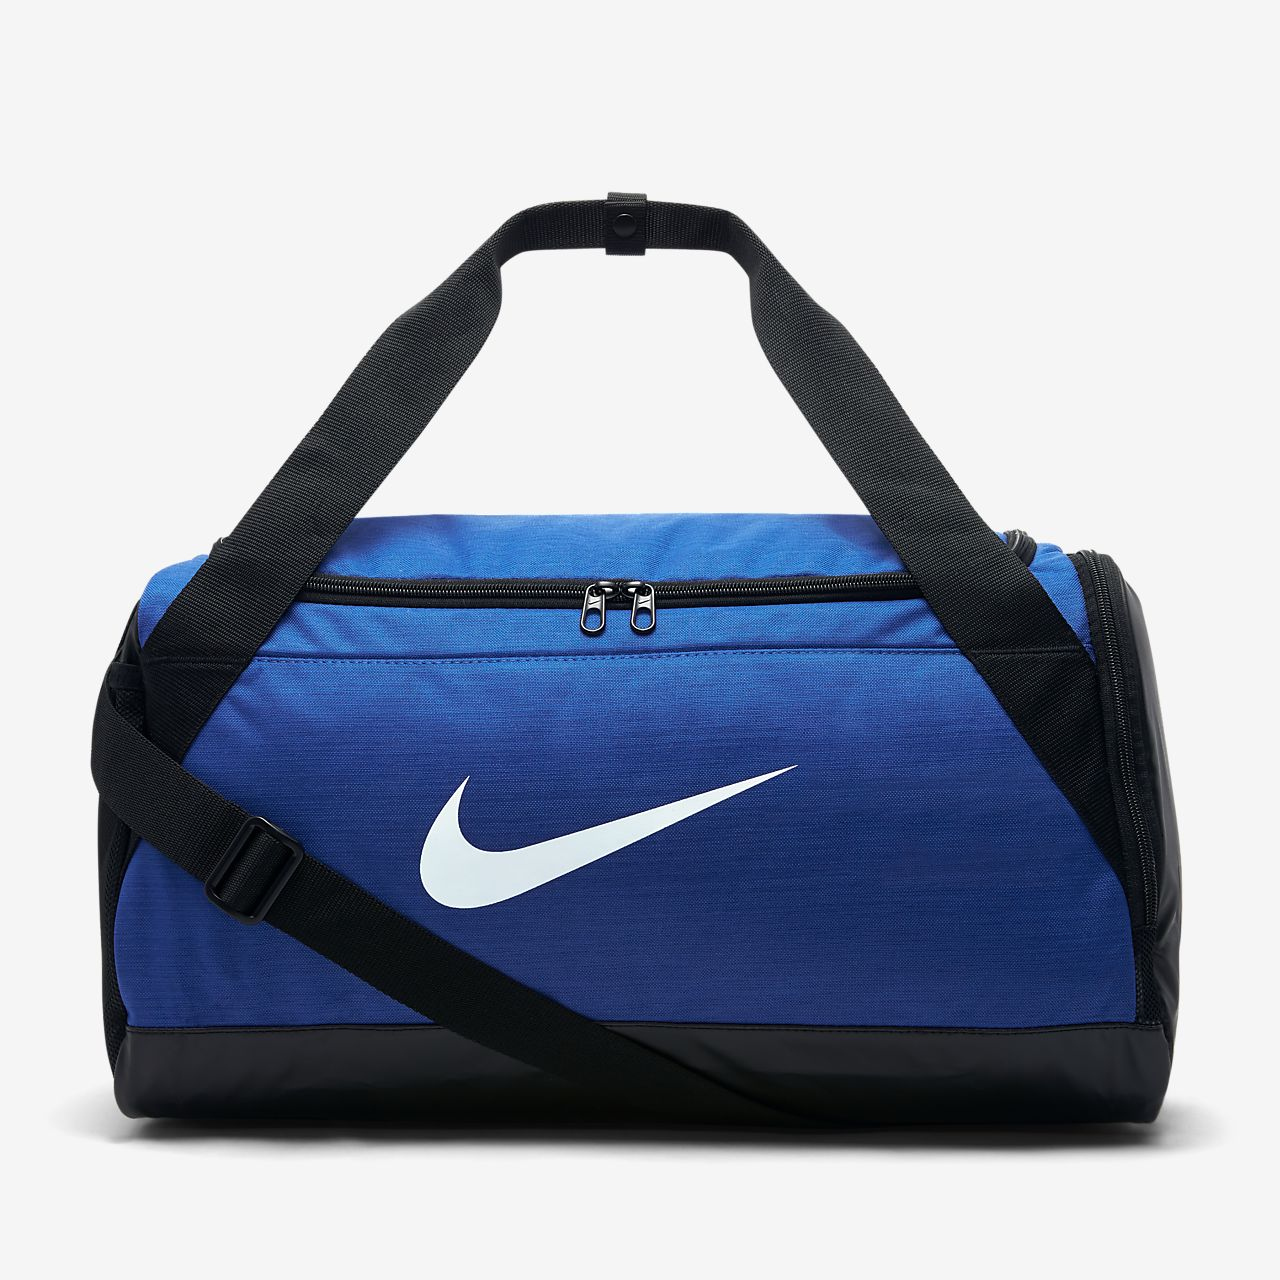 Nike De Training Brasiliapetite TailleFr Sport Sac srxCthQd